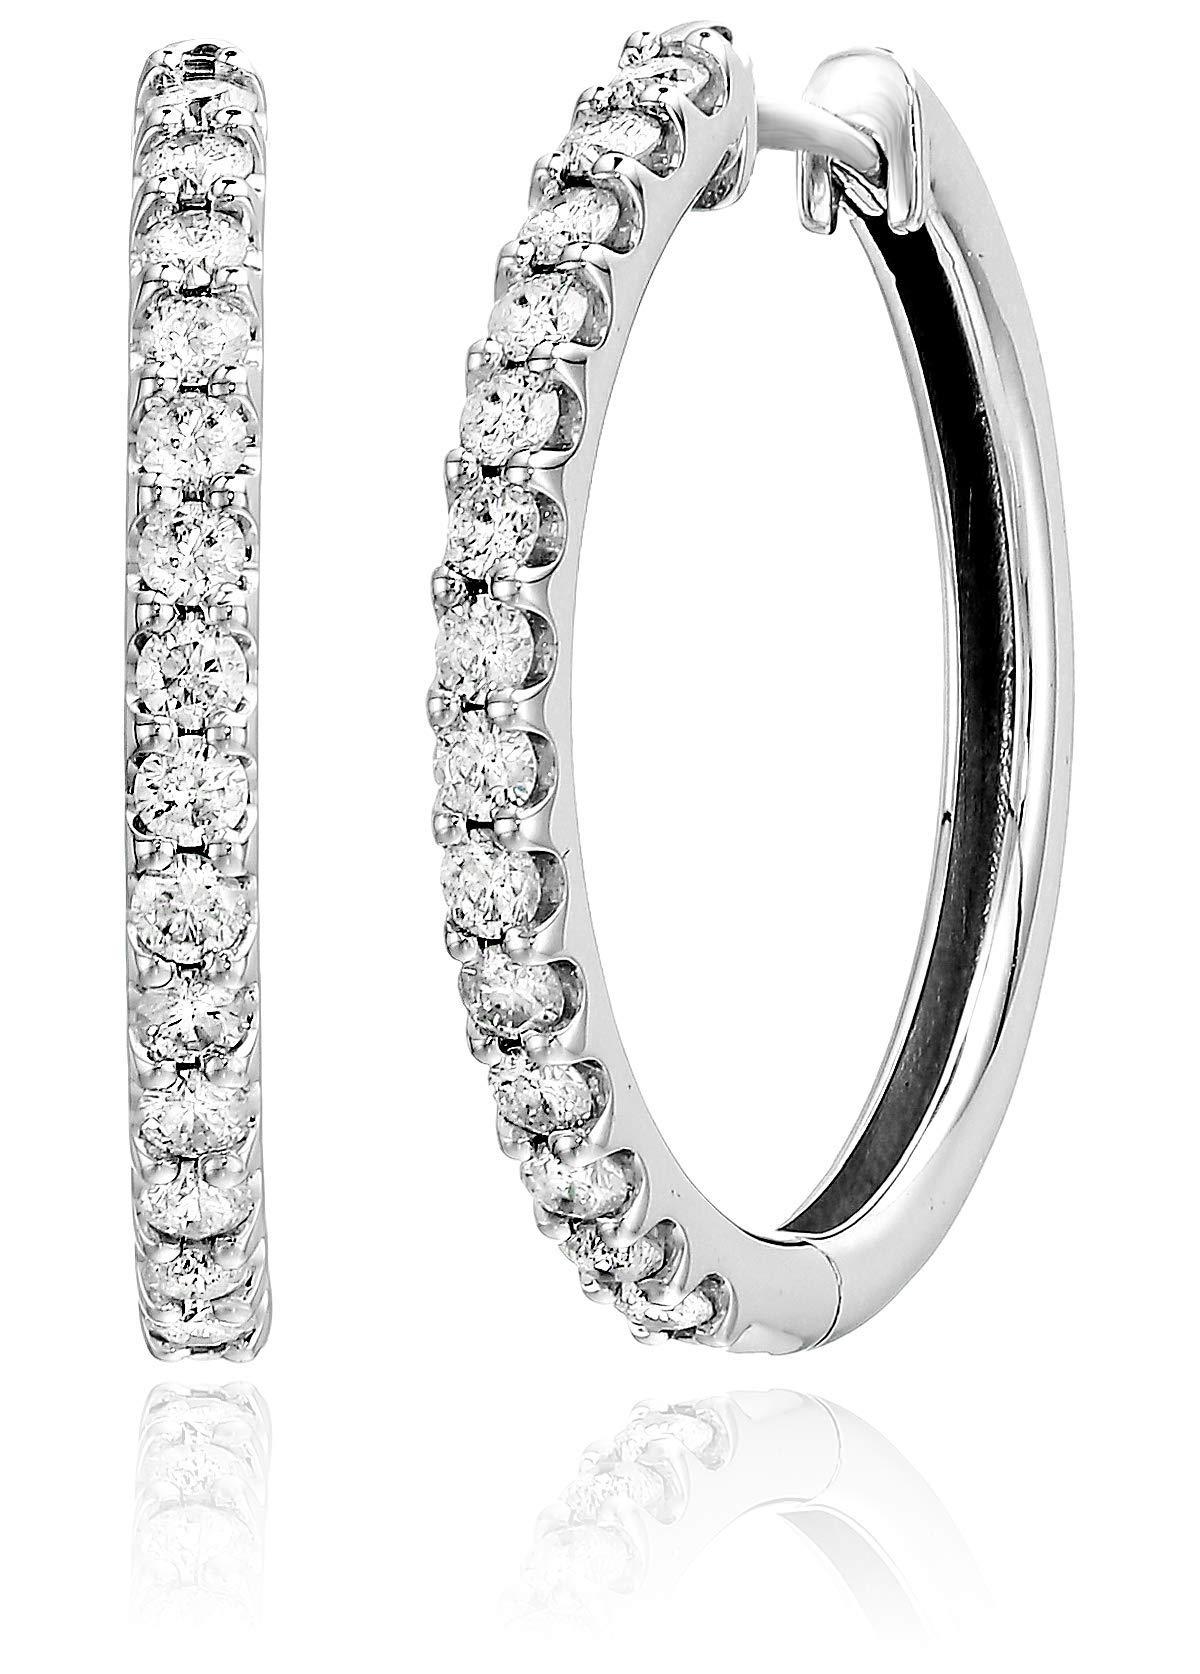 1 cttw I1-I2 AGS Certified Diamond Hoop Earrings in 10K White Gold